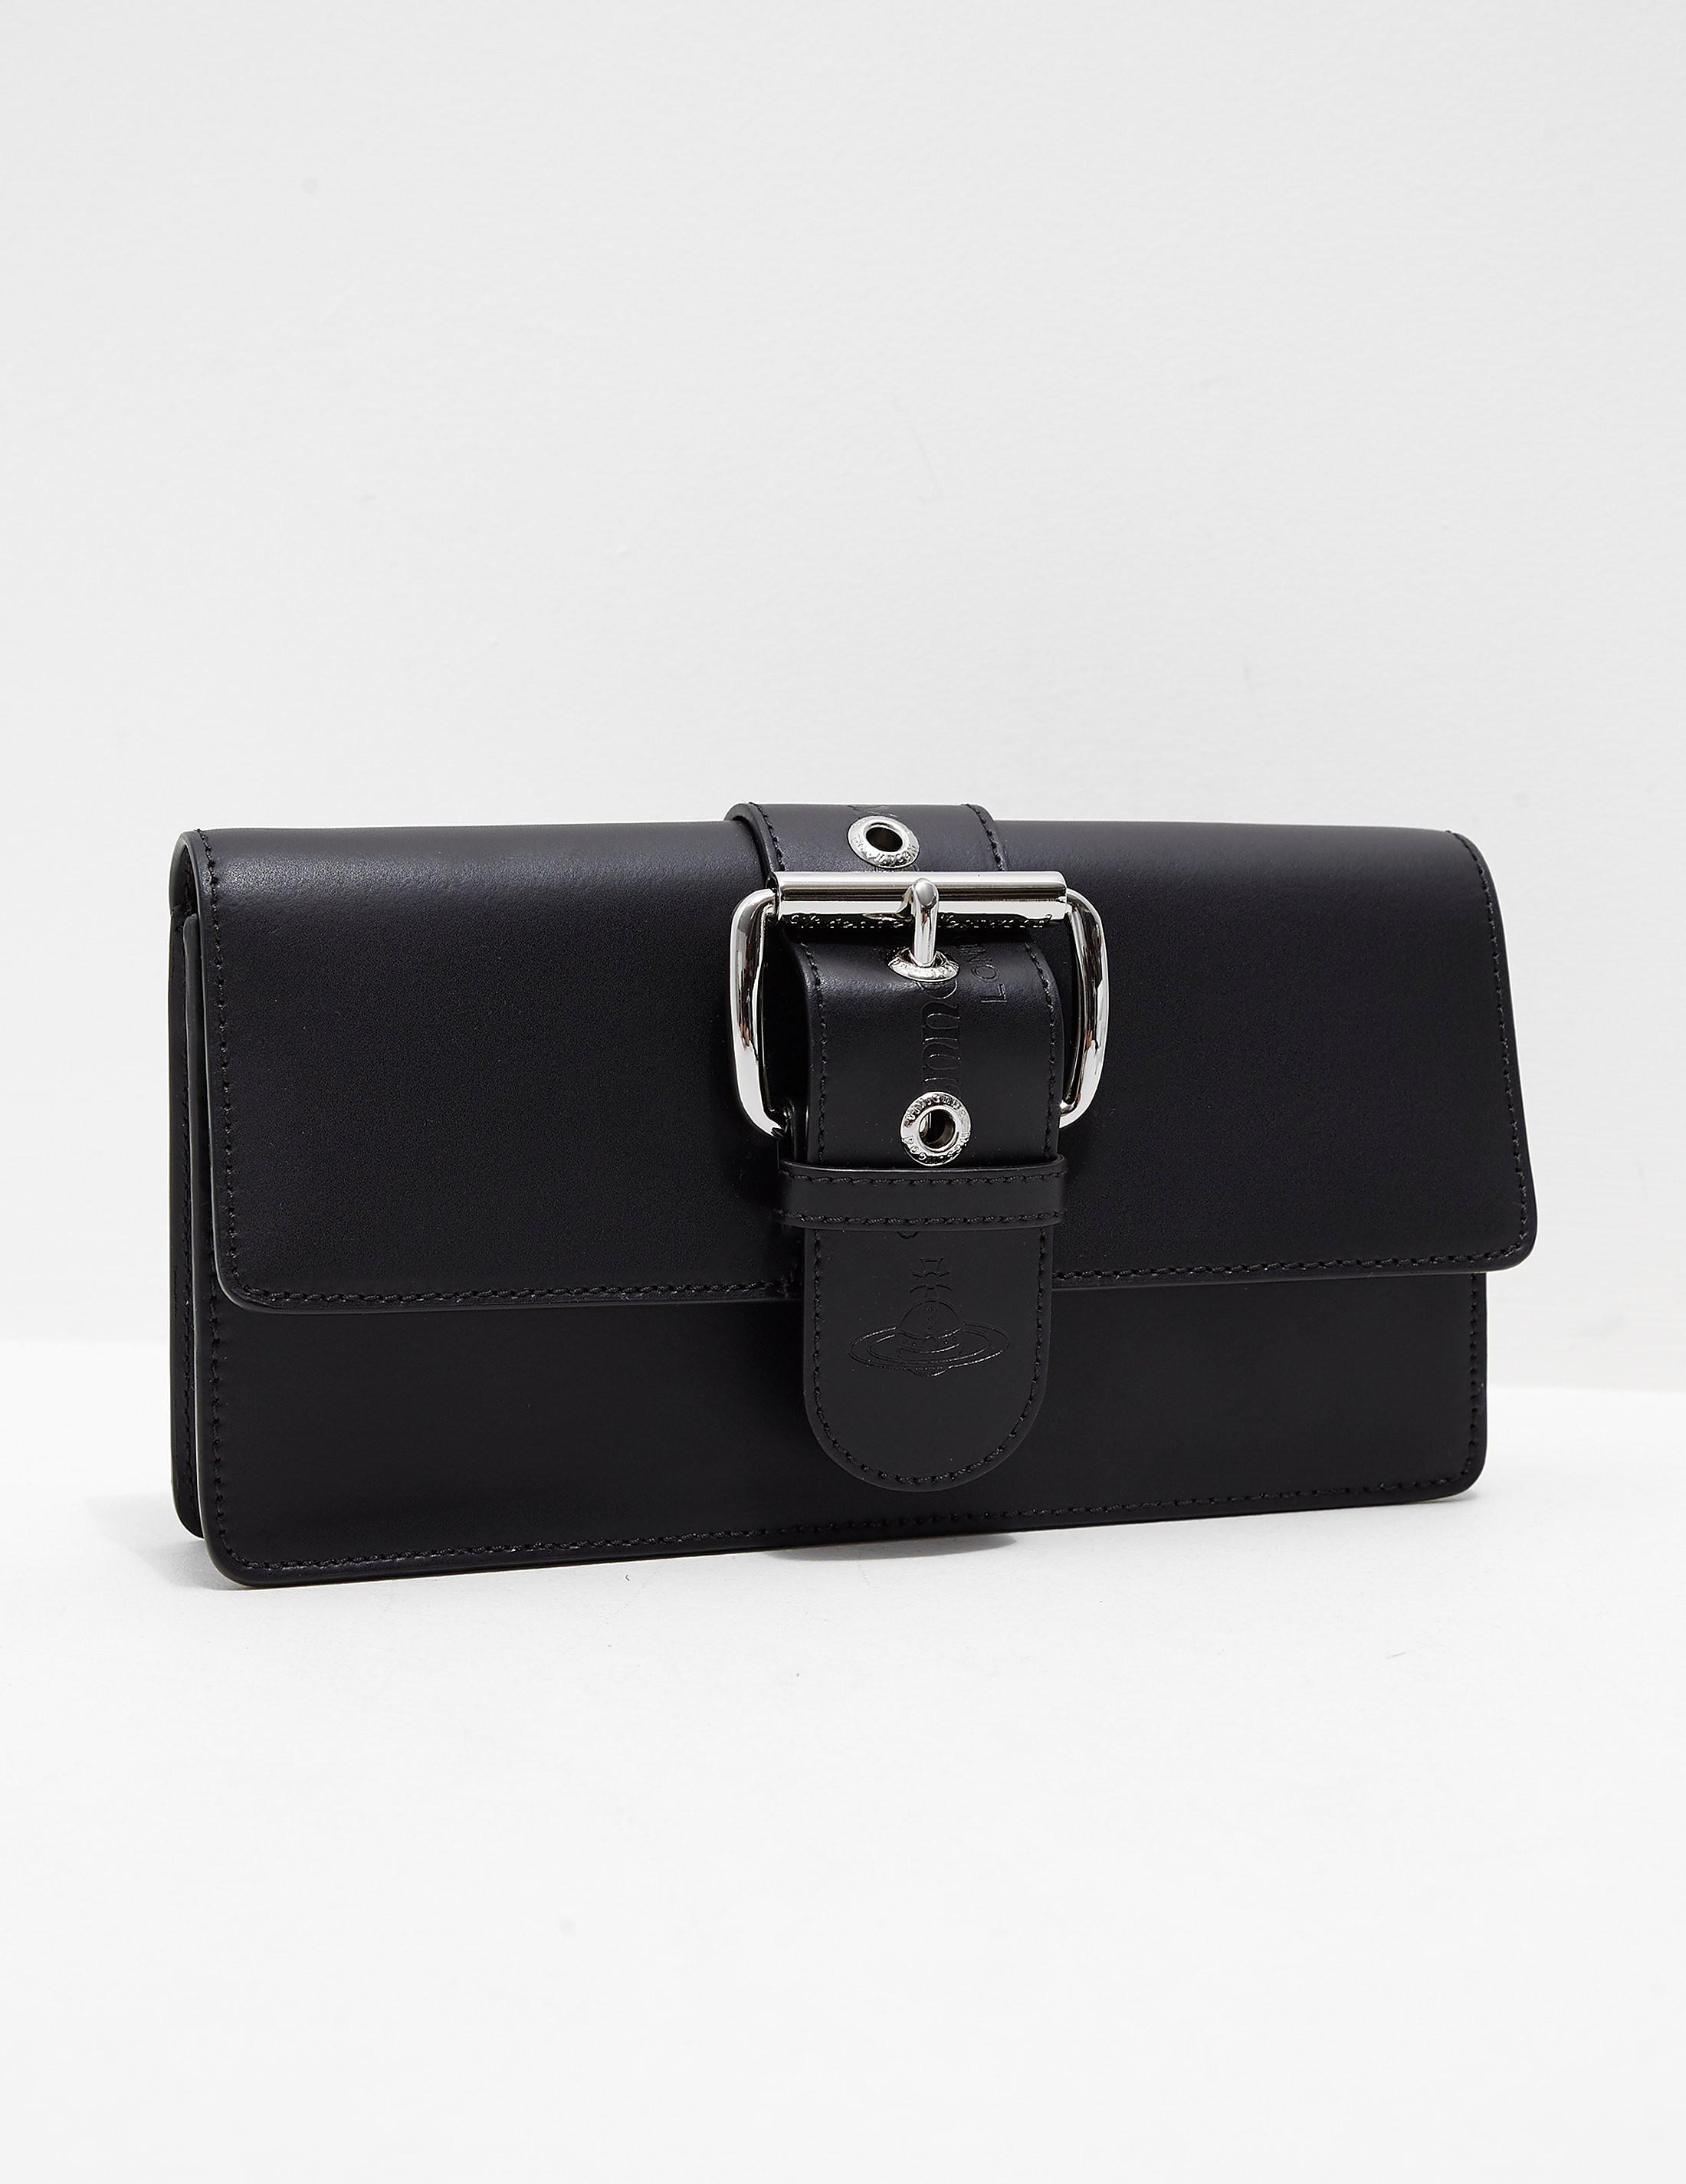 Vivienne Westwood Alex Clutch Bag - Online Exclusive